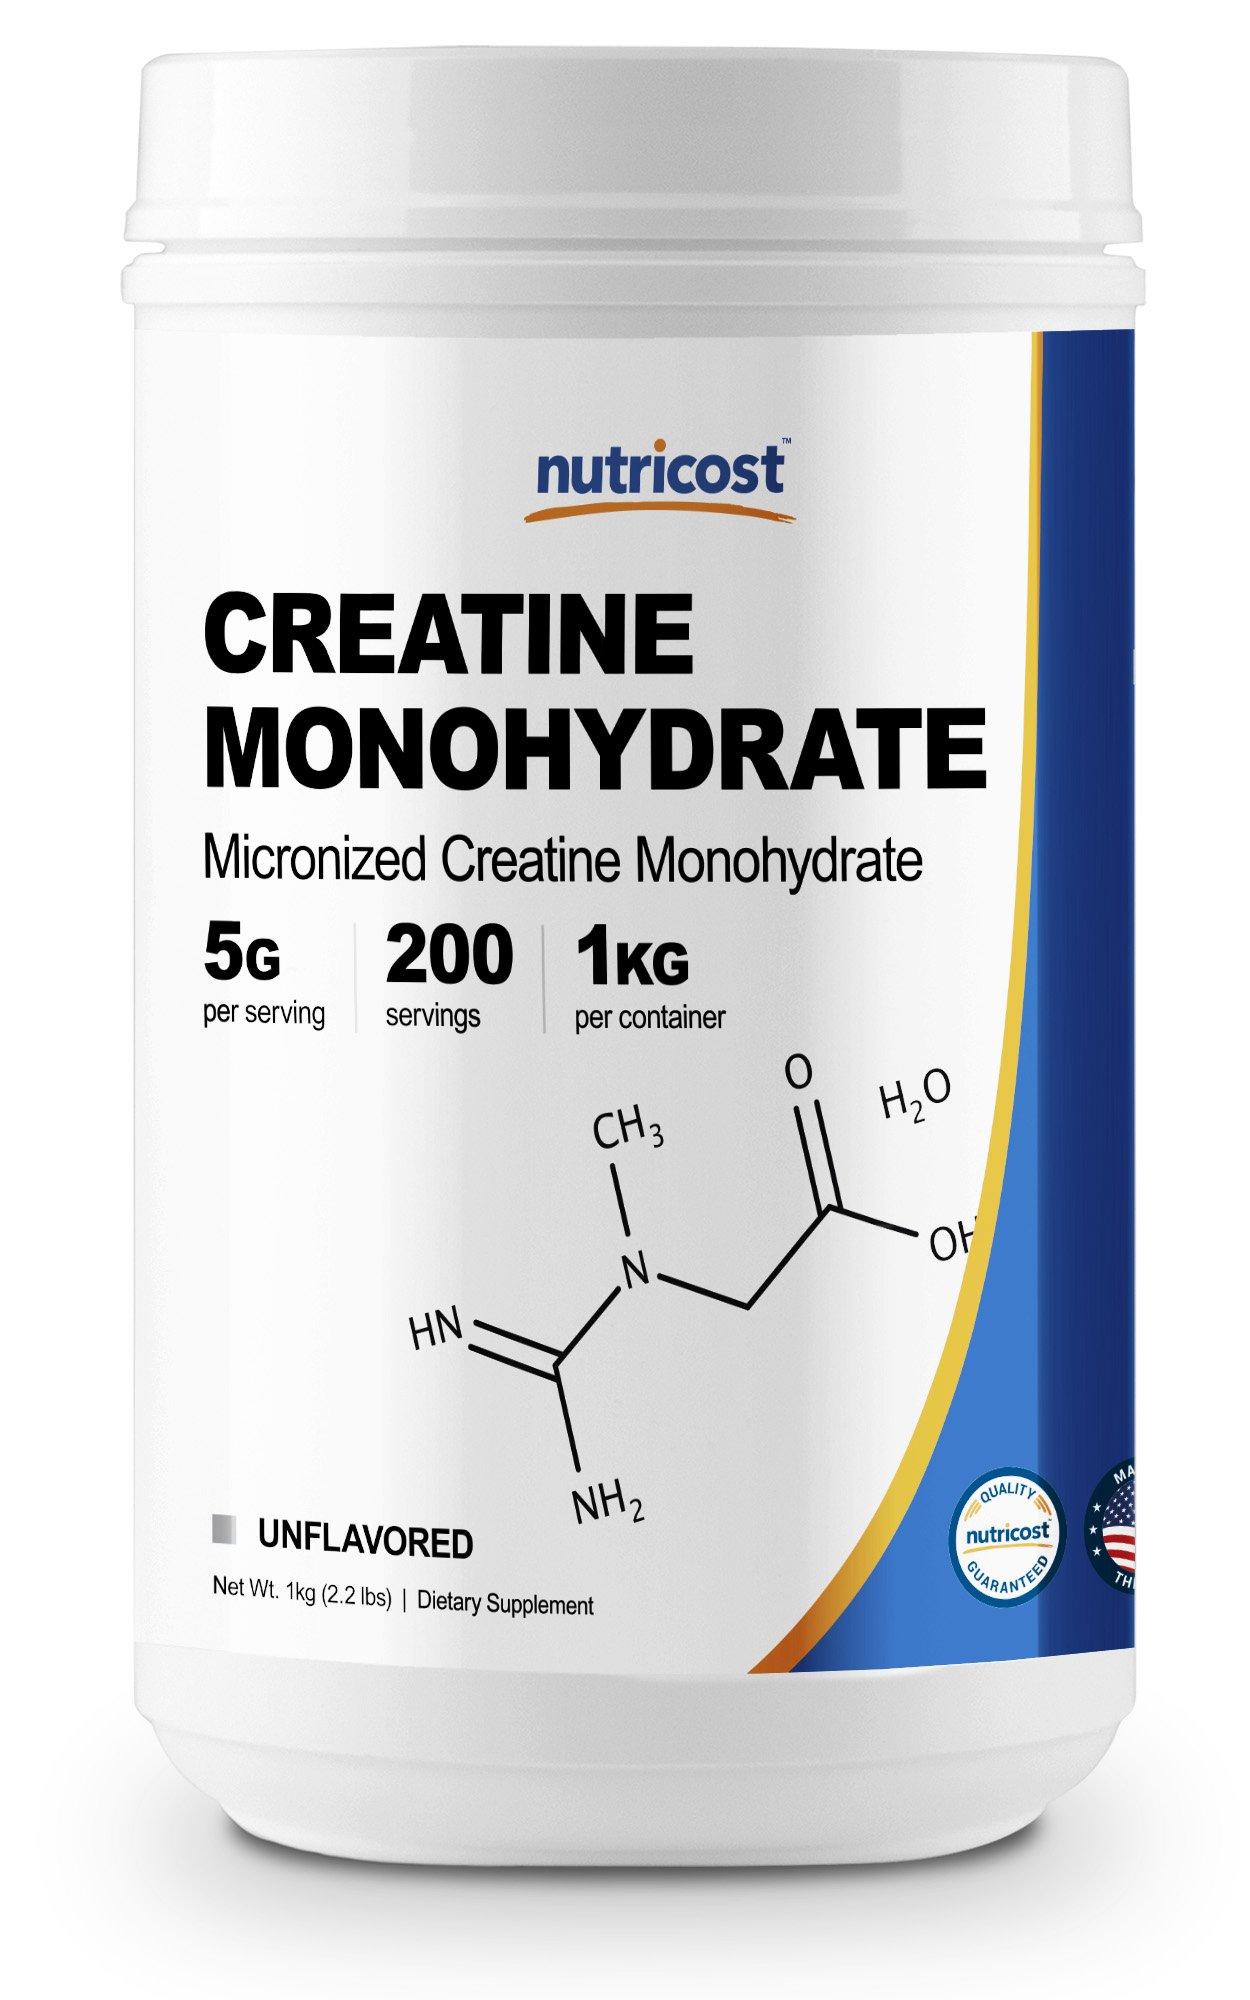 Nutricost Creatine Monohydrate Micronized Powder (1 KG) - Pure Creatine Monohydrate by Nutricost